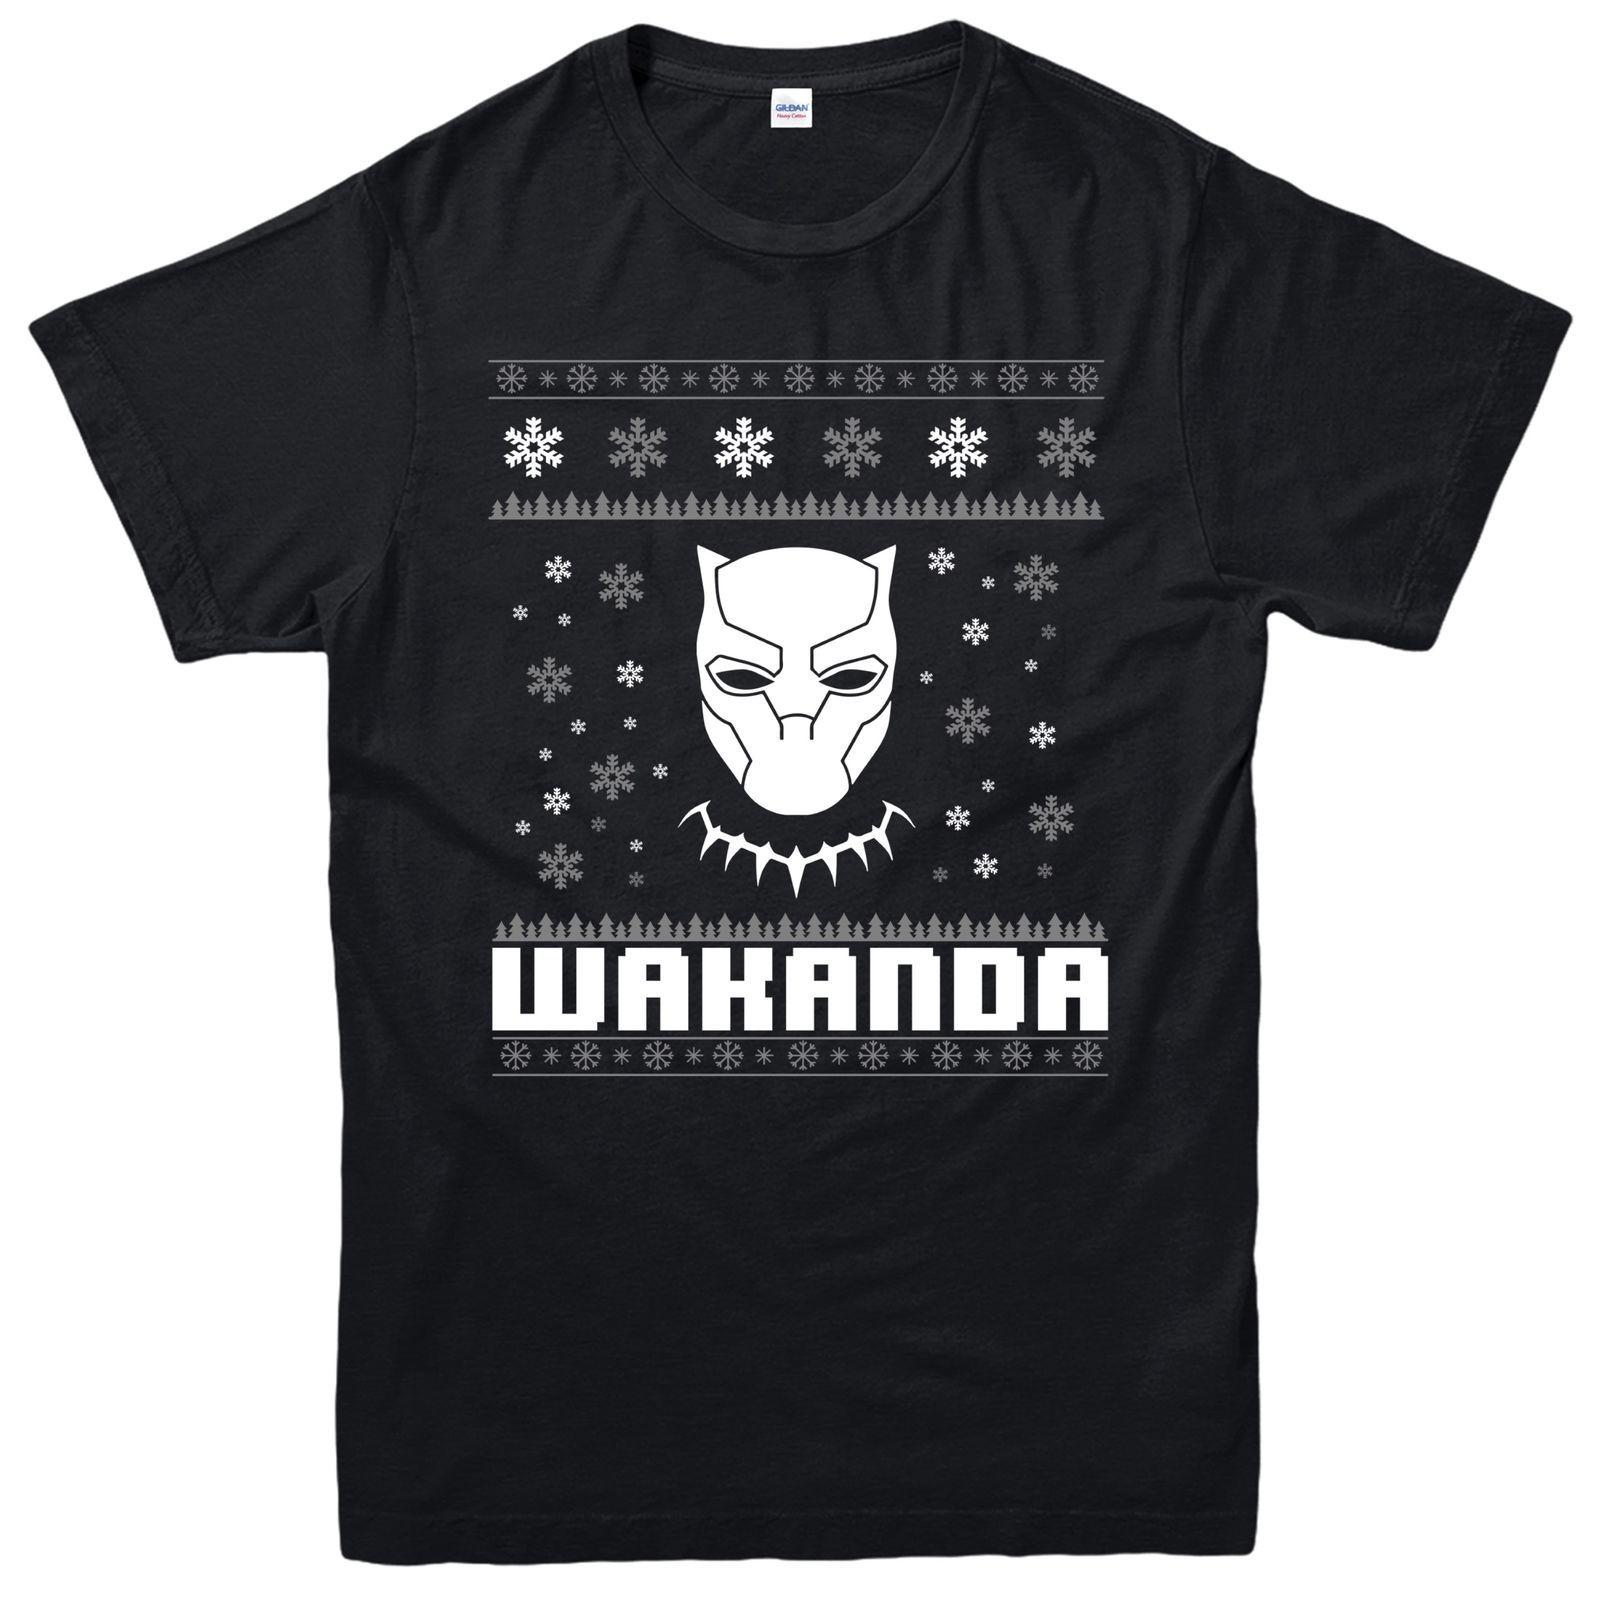 9ac64fe9 Black Panther Christmas T-Shirt, Avengers Wakanda Festive Gift Adults &  Kids Tee